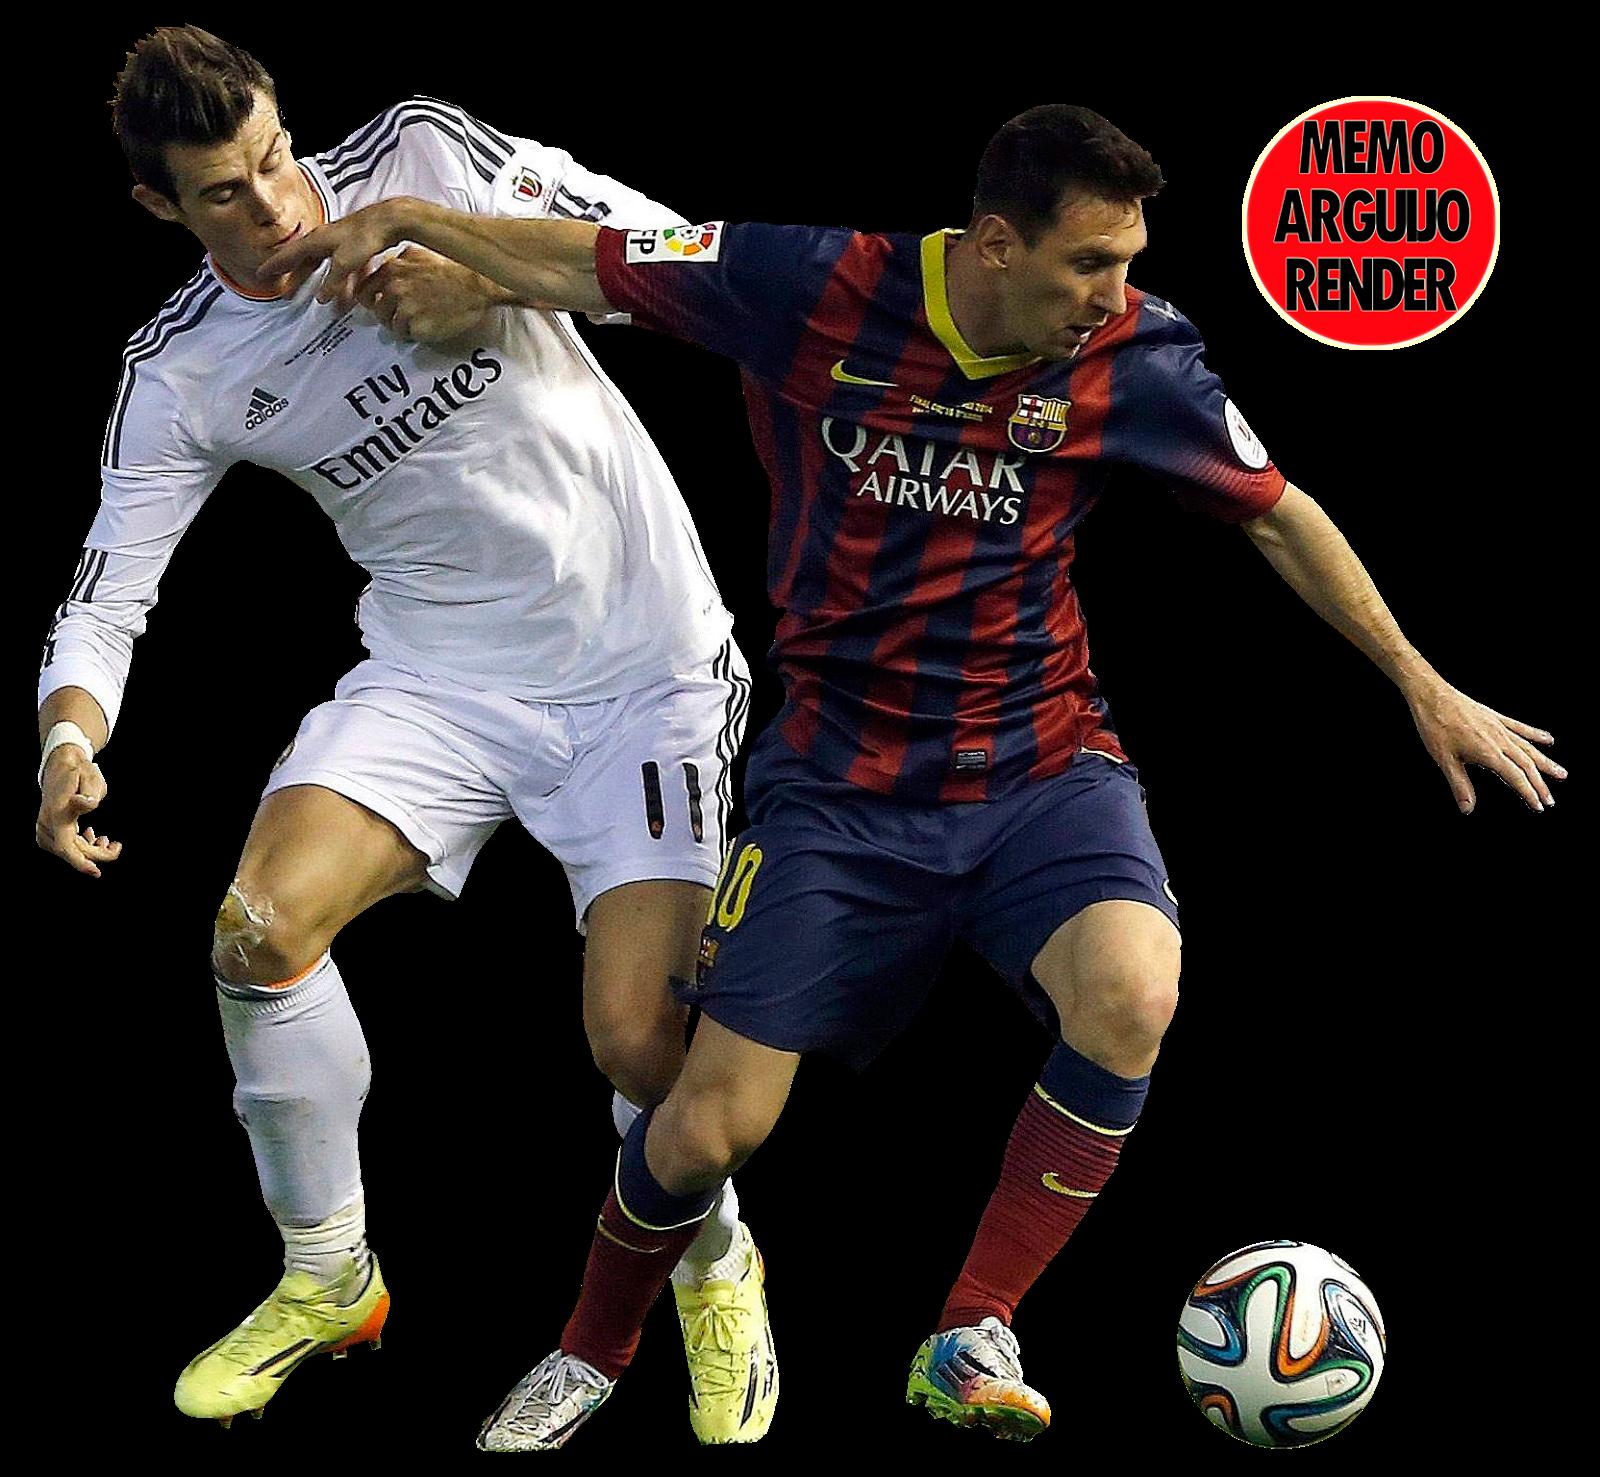 Barcelona Vs Celta Vigo Youtube: Promocionado Por / Sponsored By